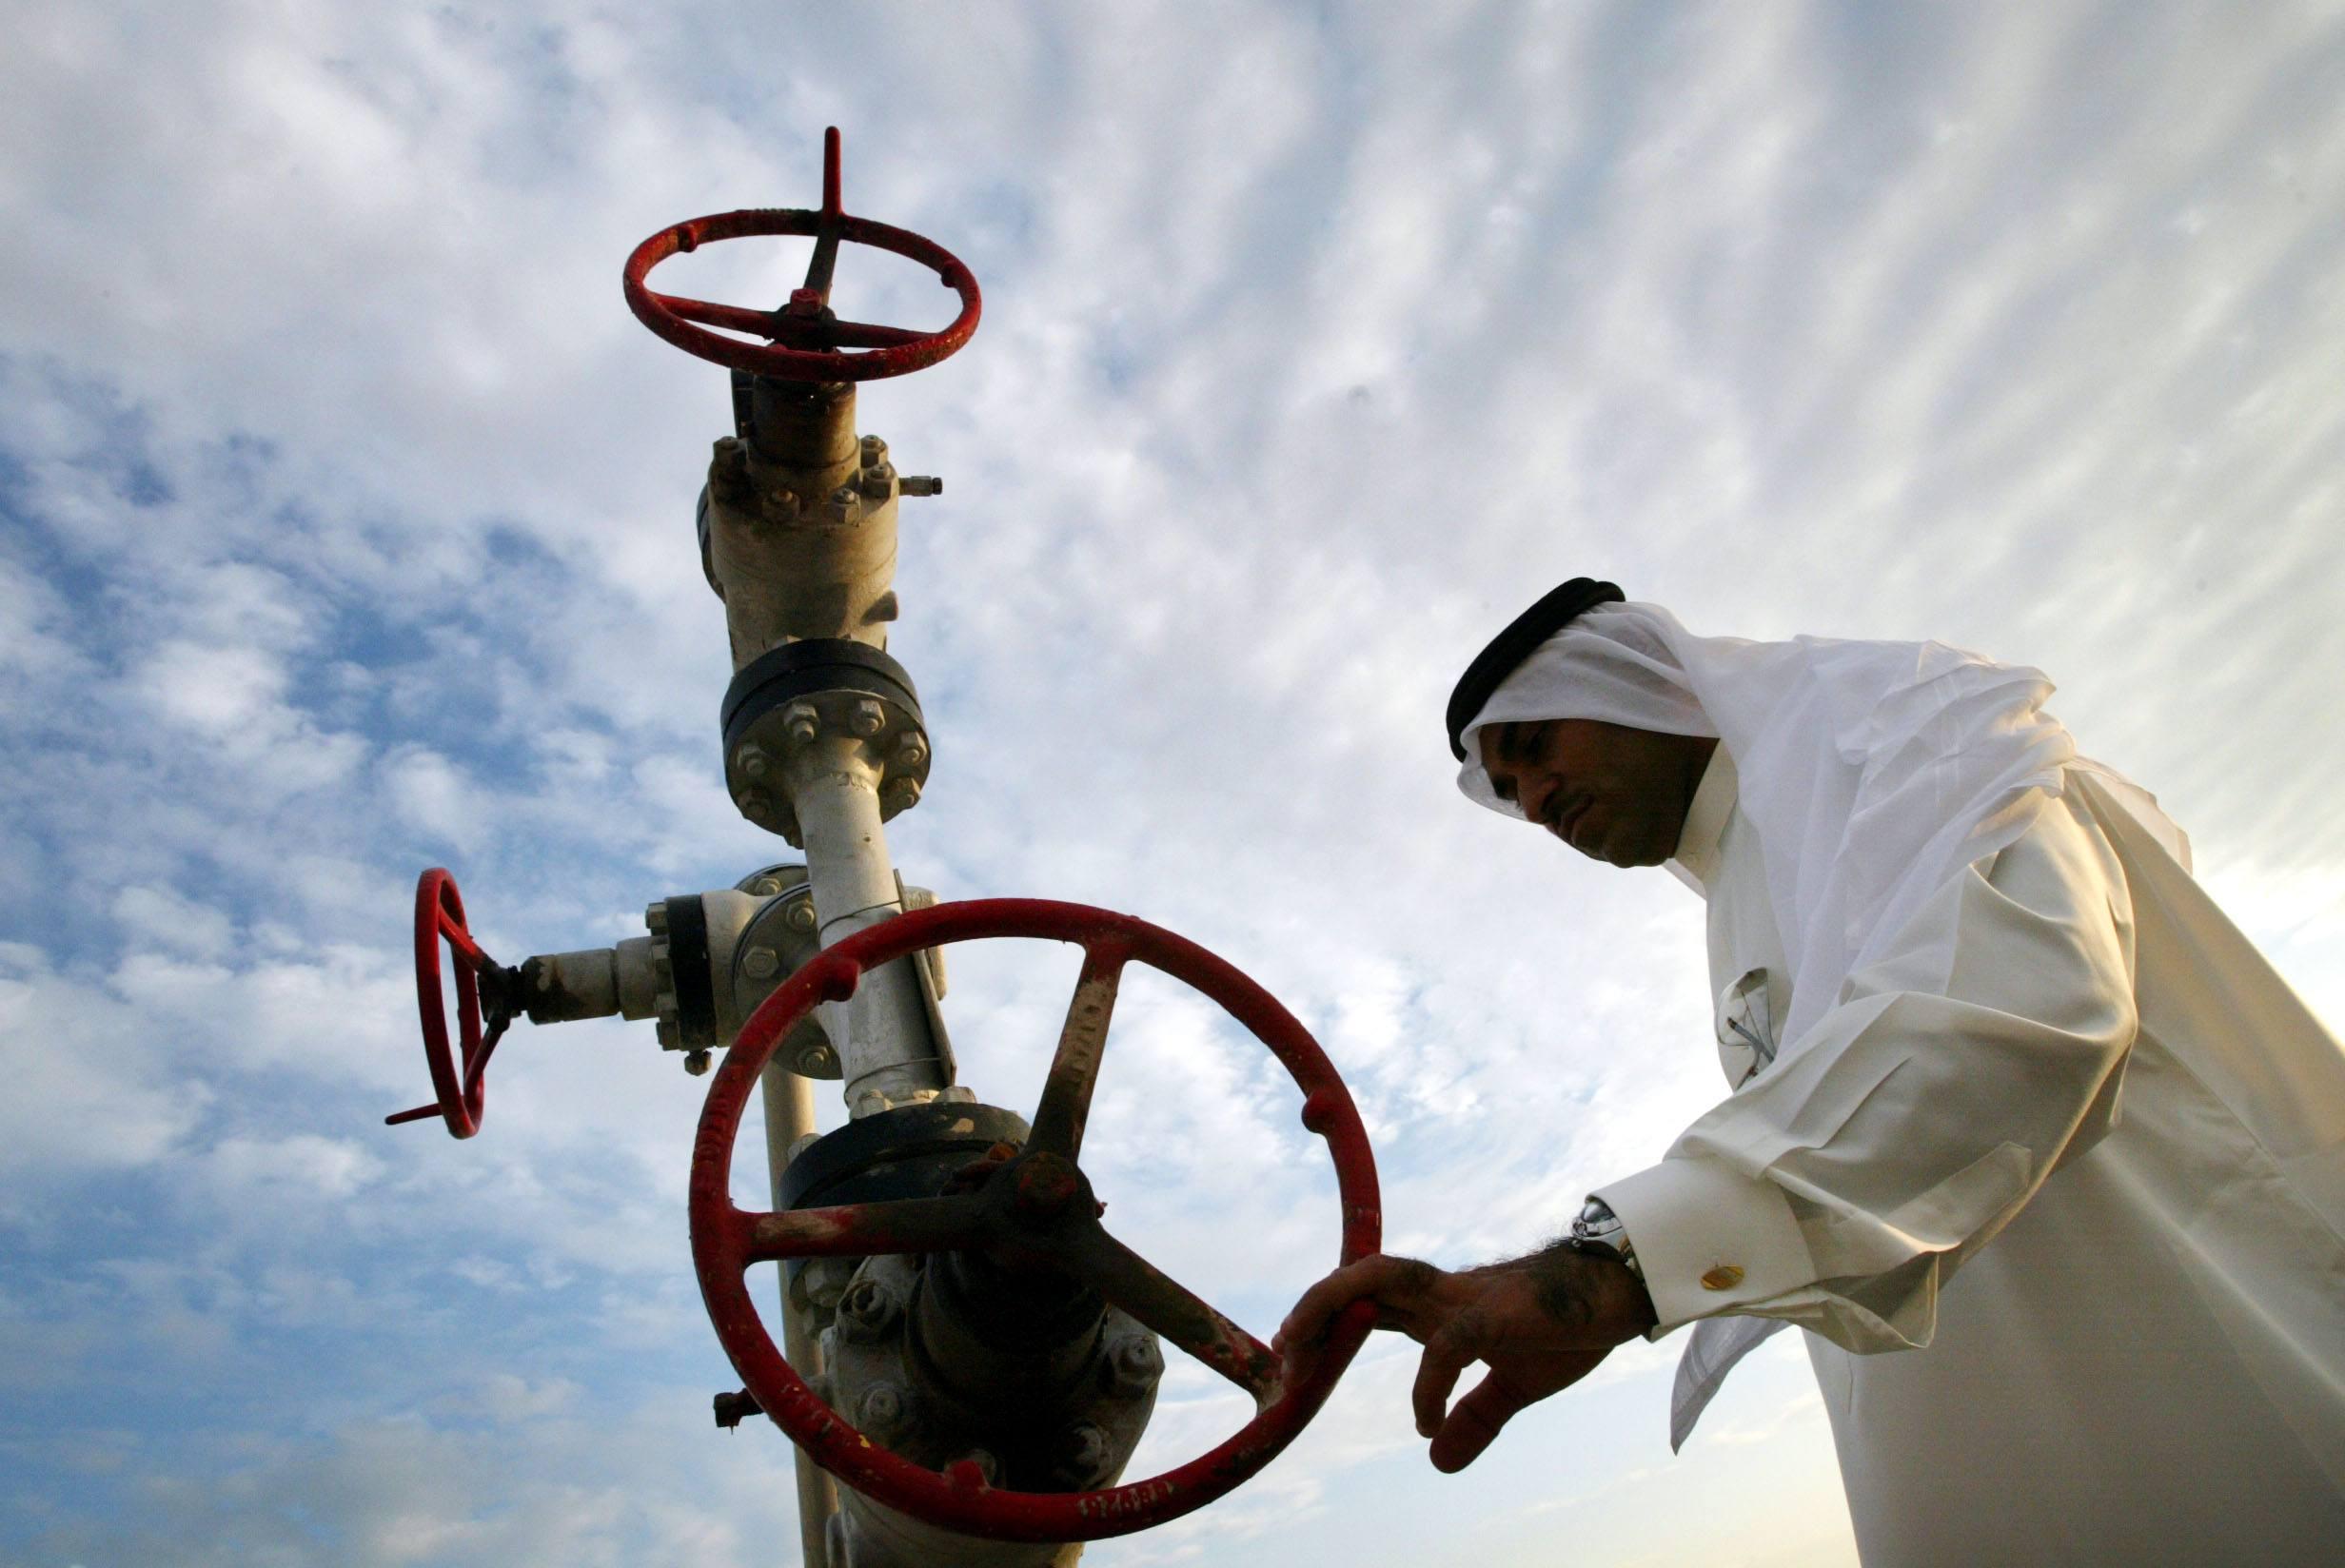 Khalid Abdulla Alhajeri looks at a natural gas pipe in Manama, Bahrain